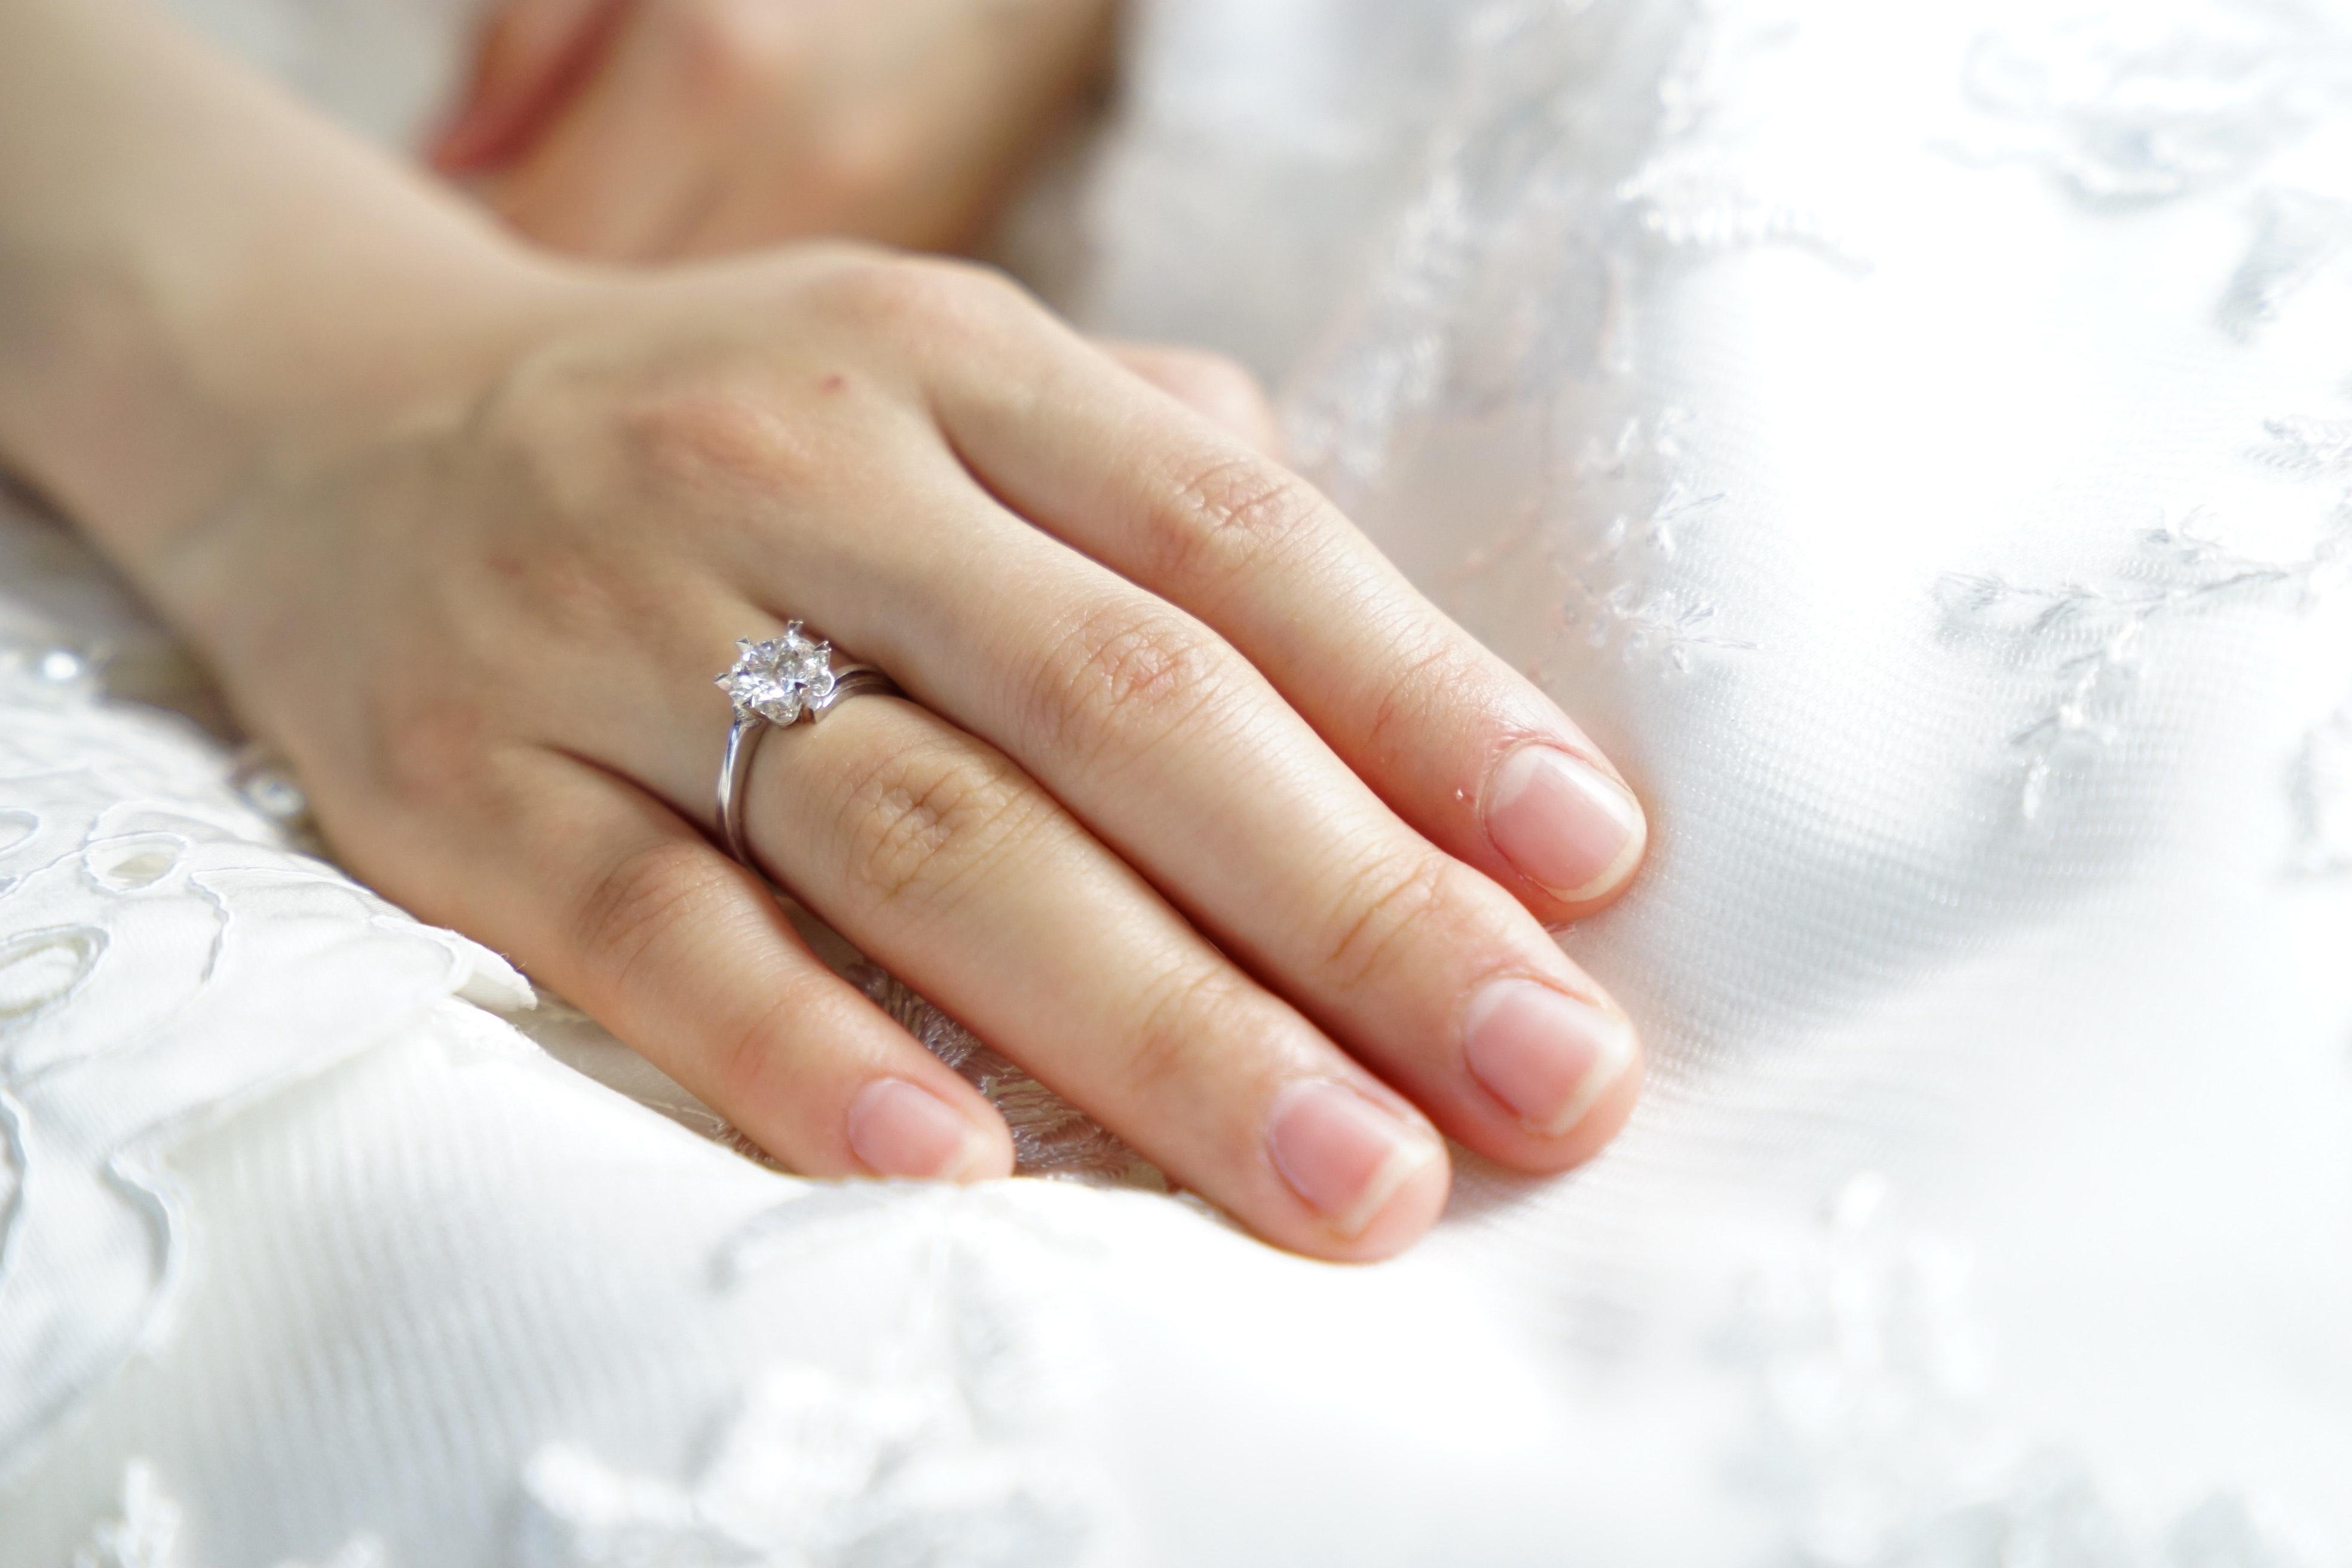 bride-clean-finger-265804 (2)